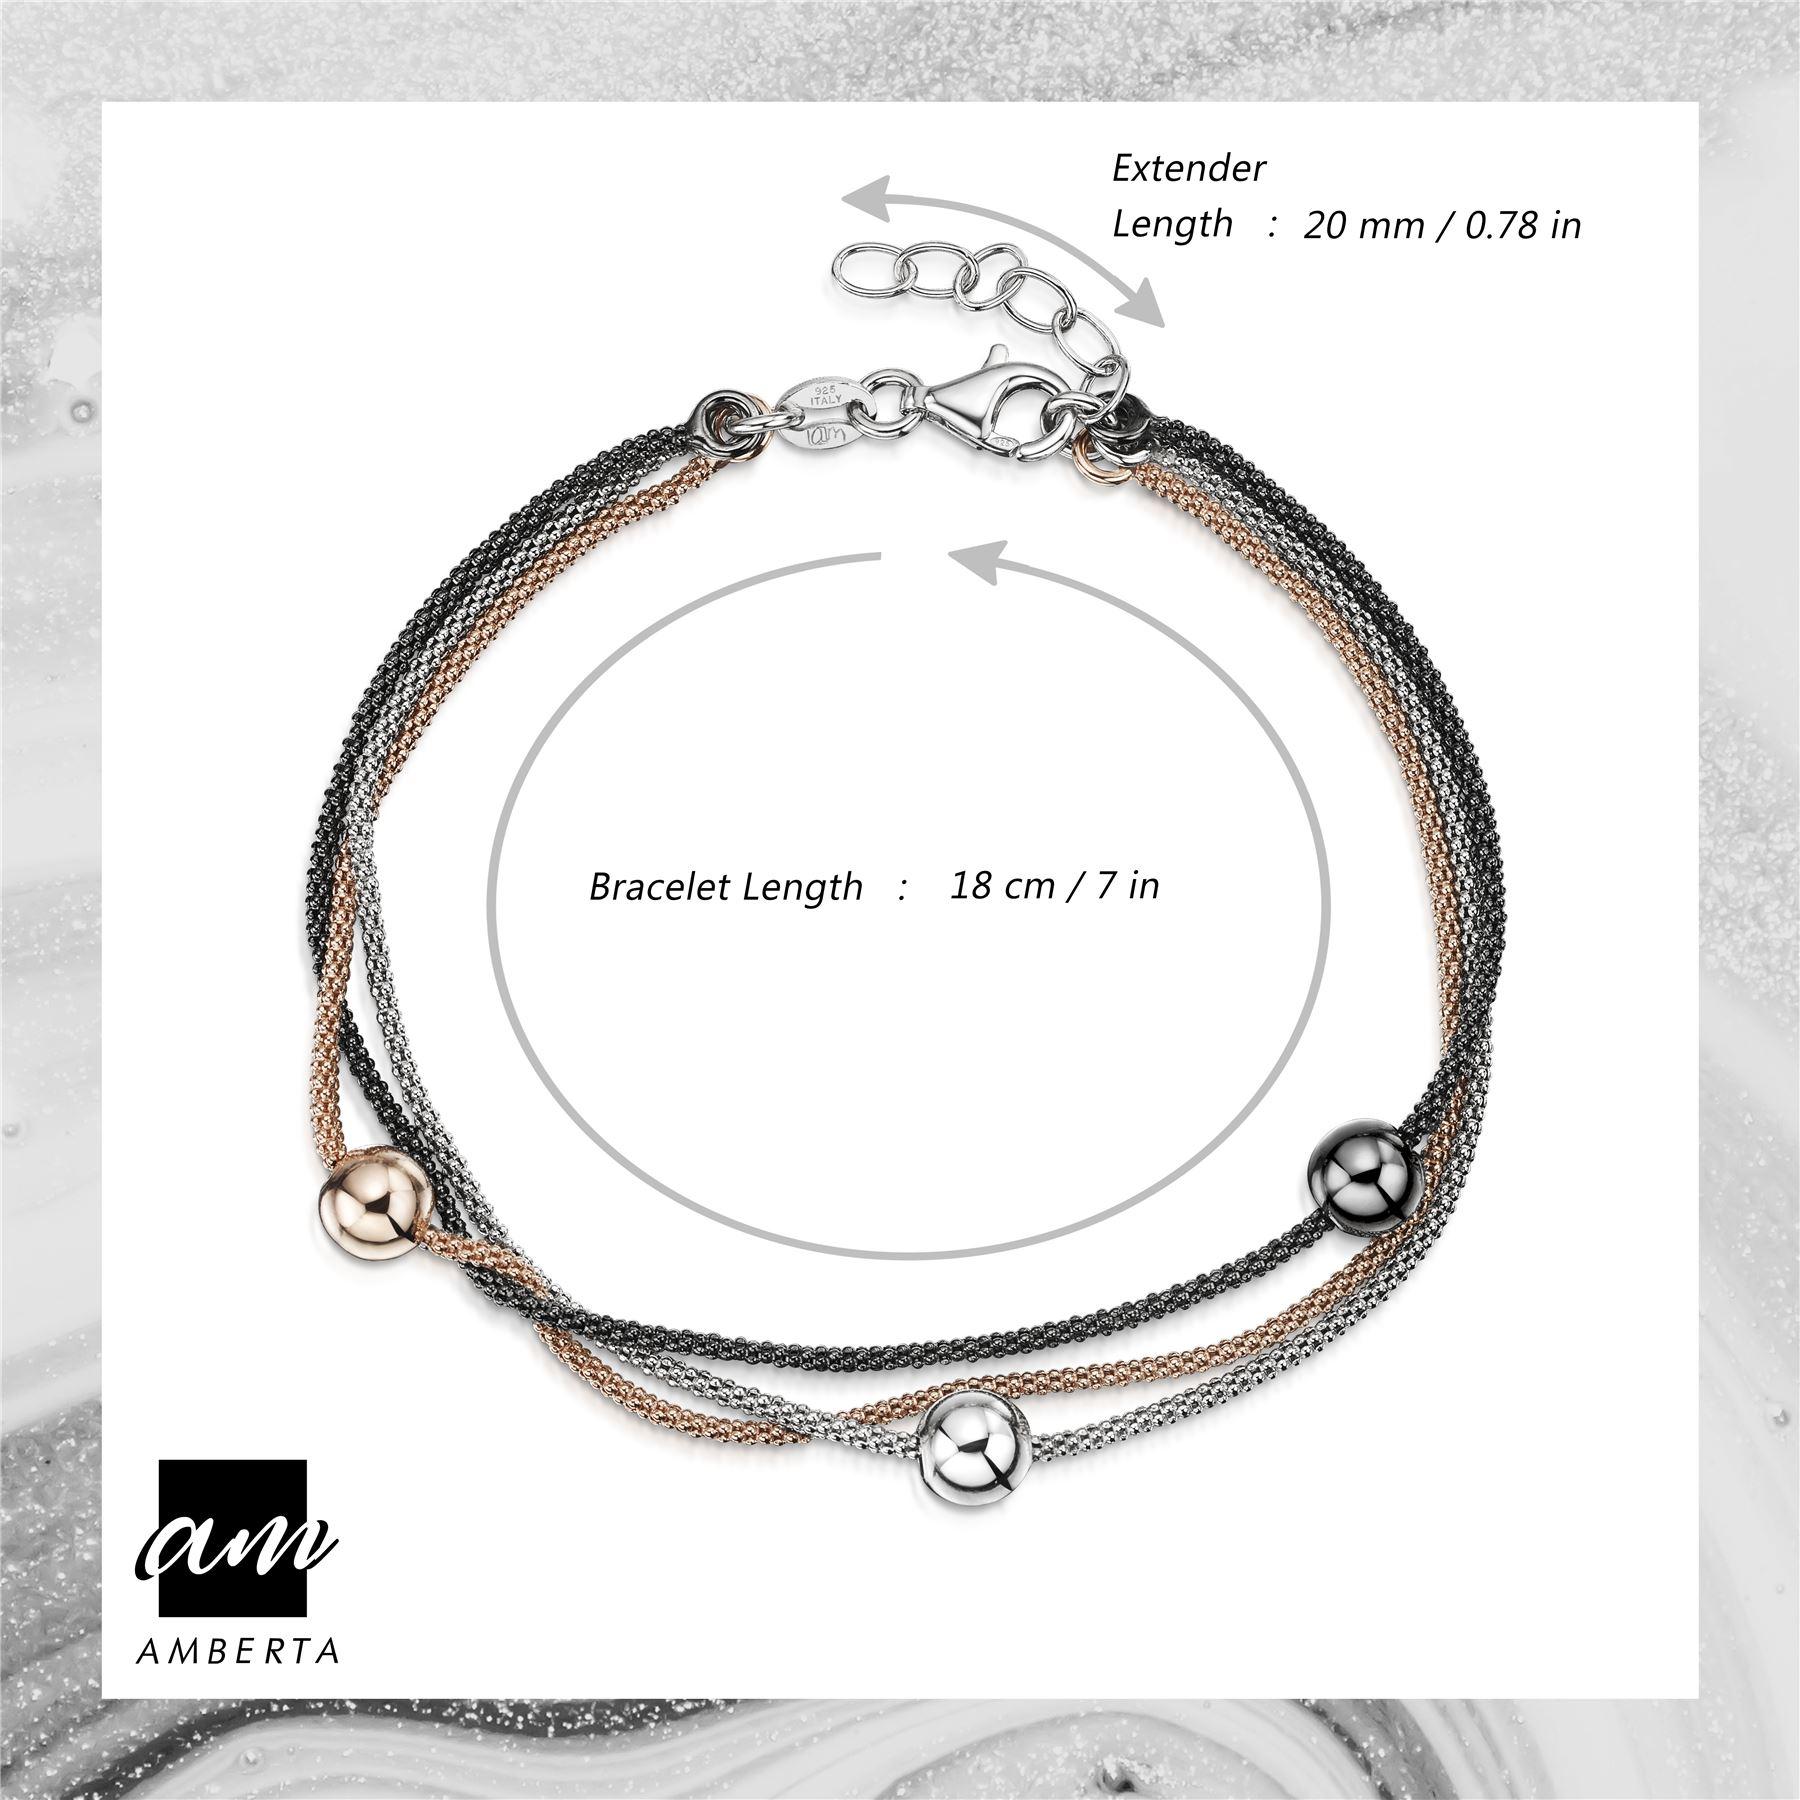 Amberta-925-Sterling-Silver-Adjustable-Multi-Layered-Chain-Bracelet-for-Women miniature 3